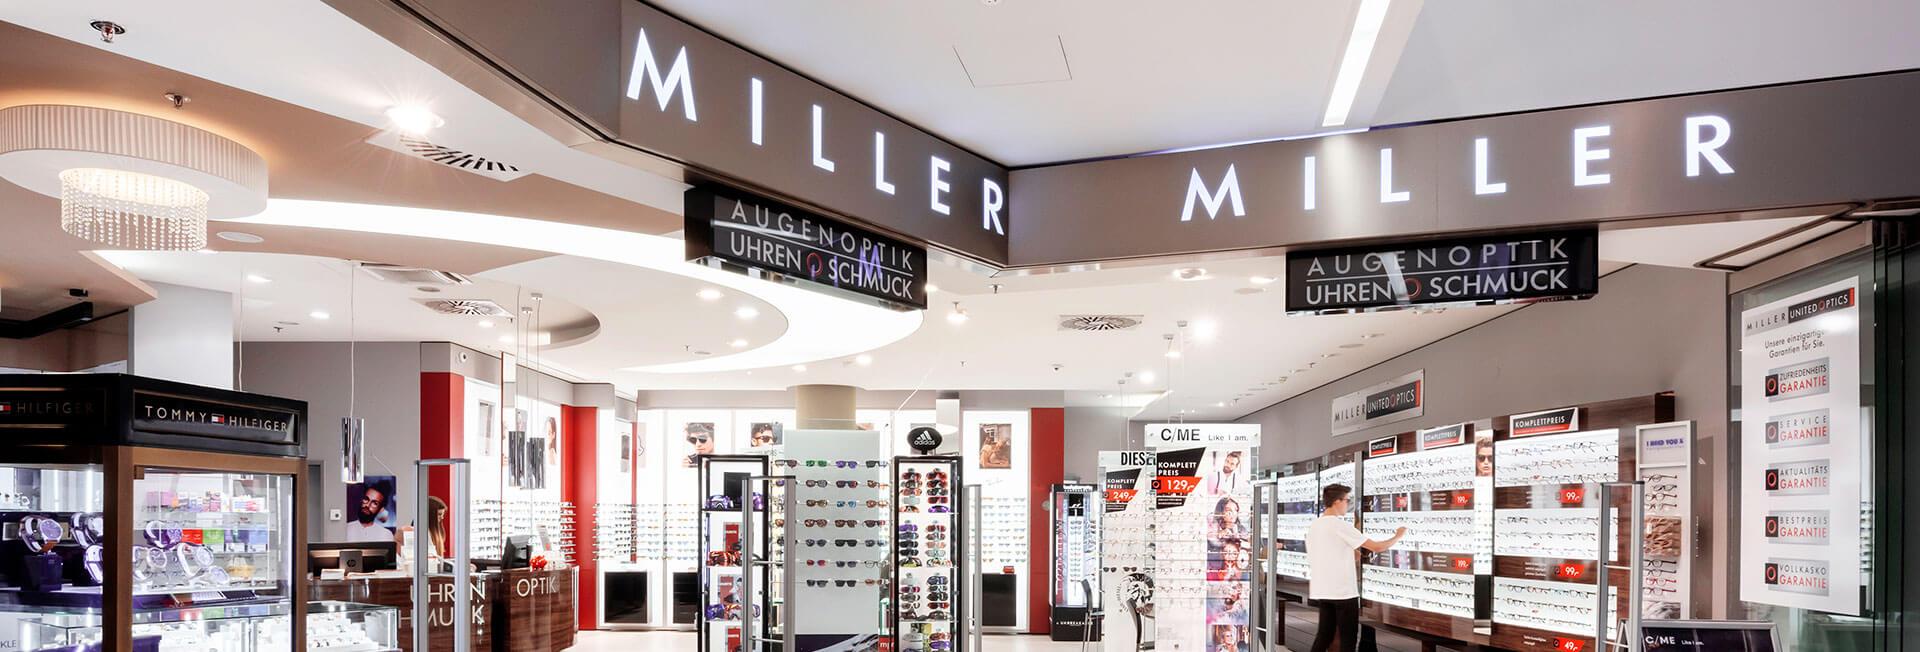 Miller United Optics im Kaufhaus Tyrol